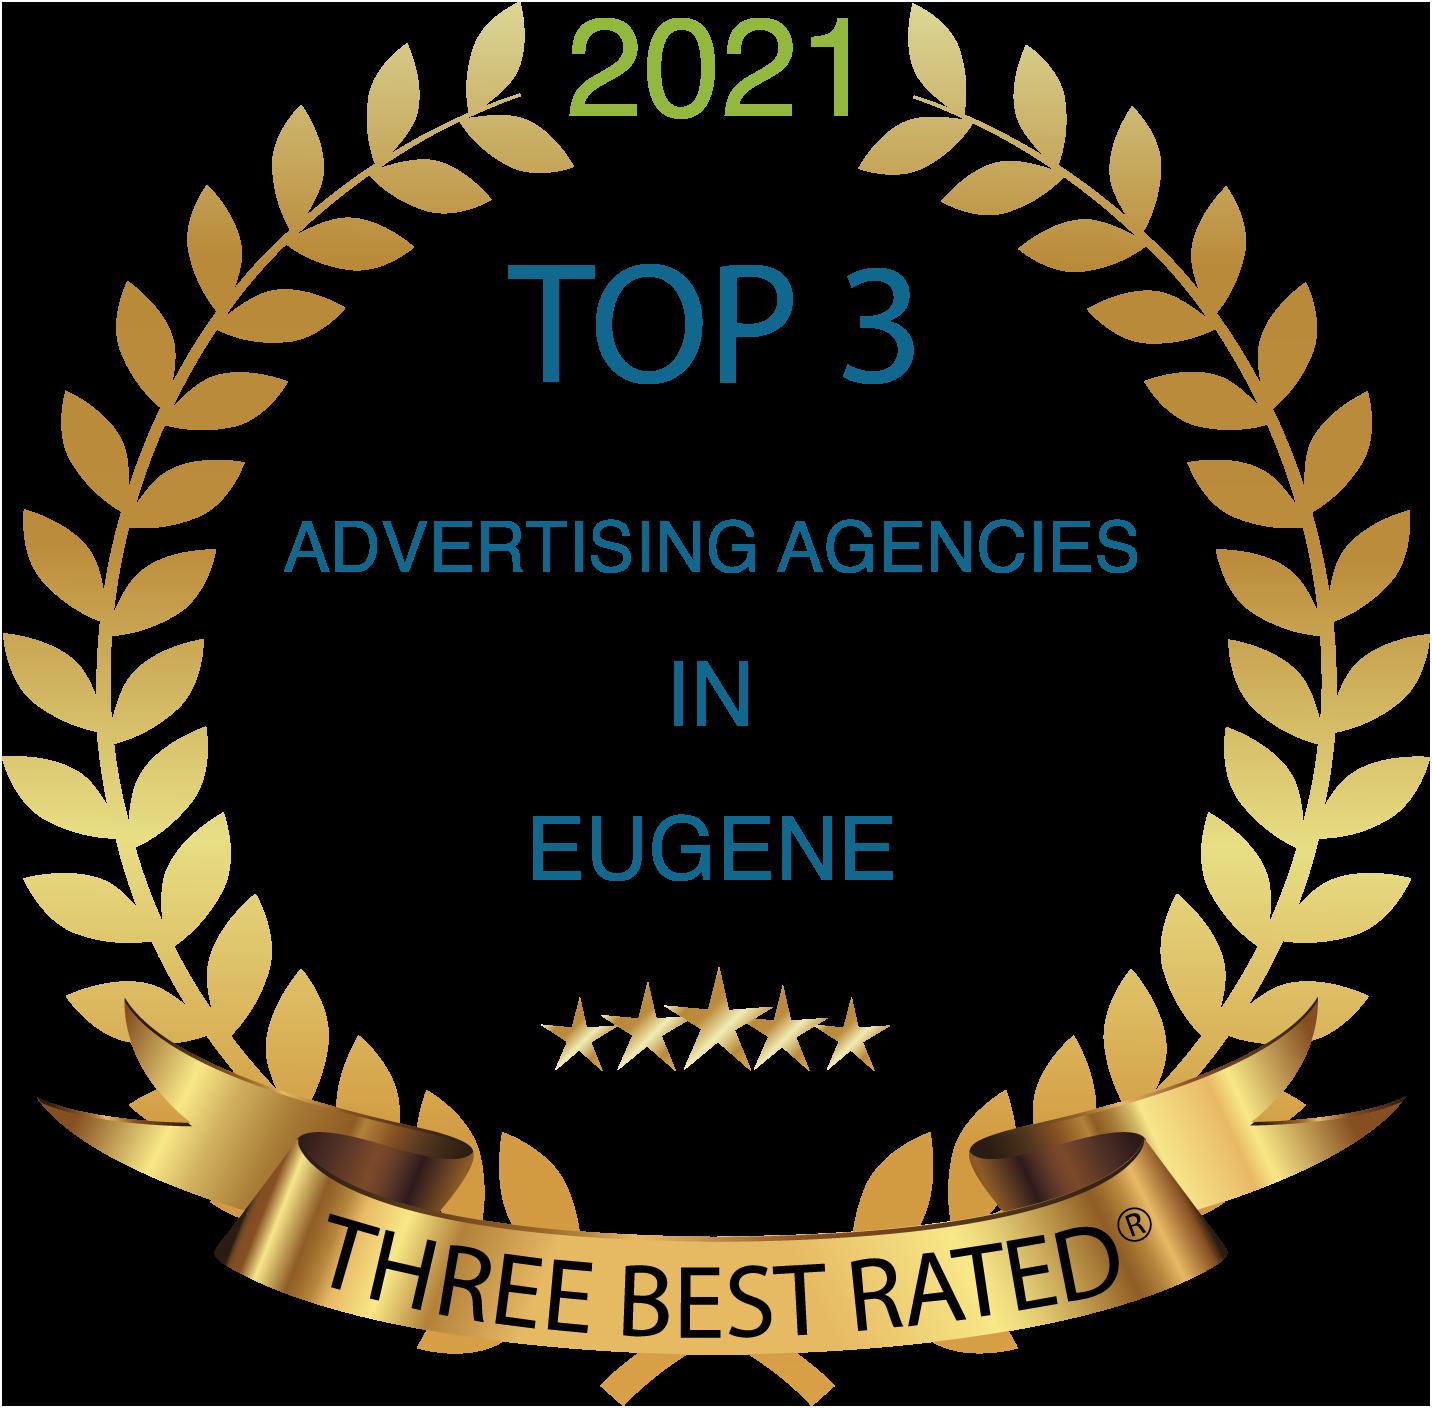 top-3-advertising_agencies-eugene-2021-clr.png